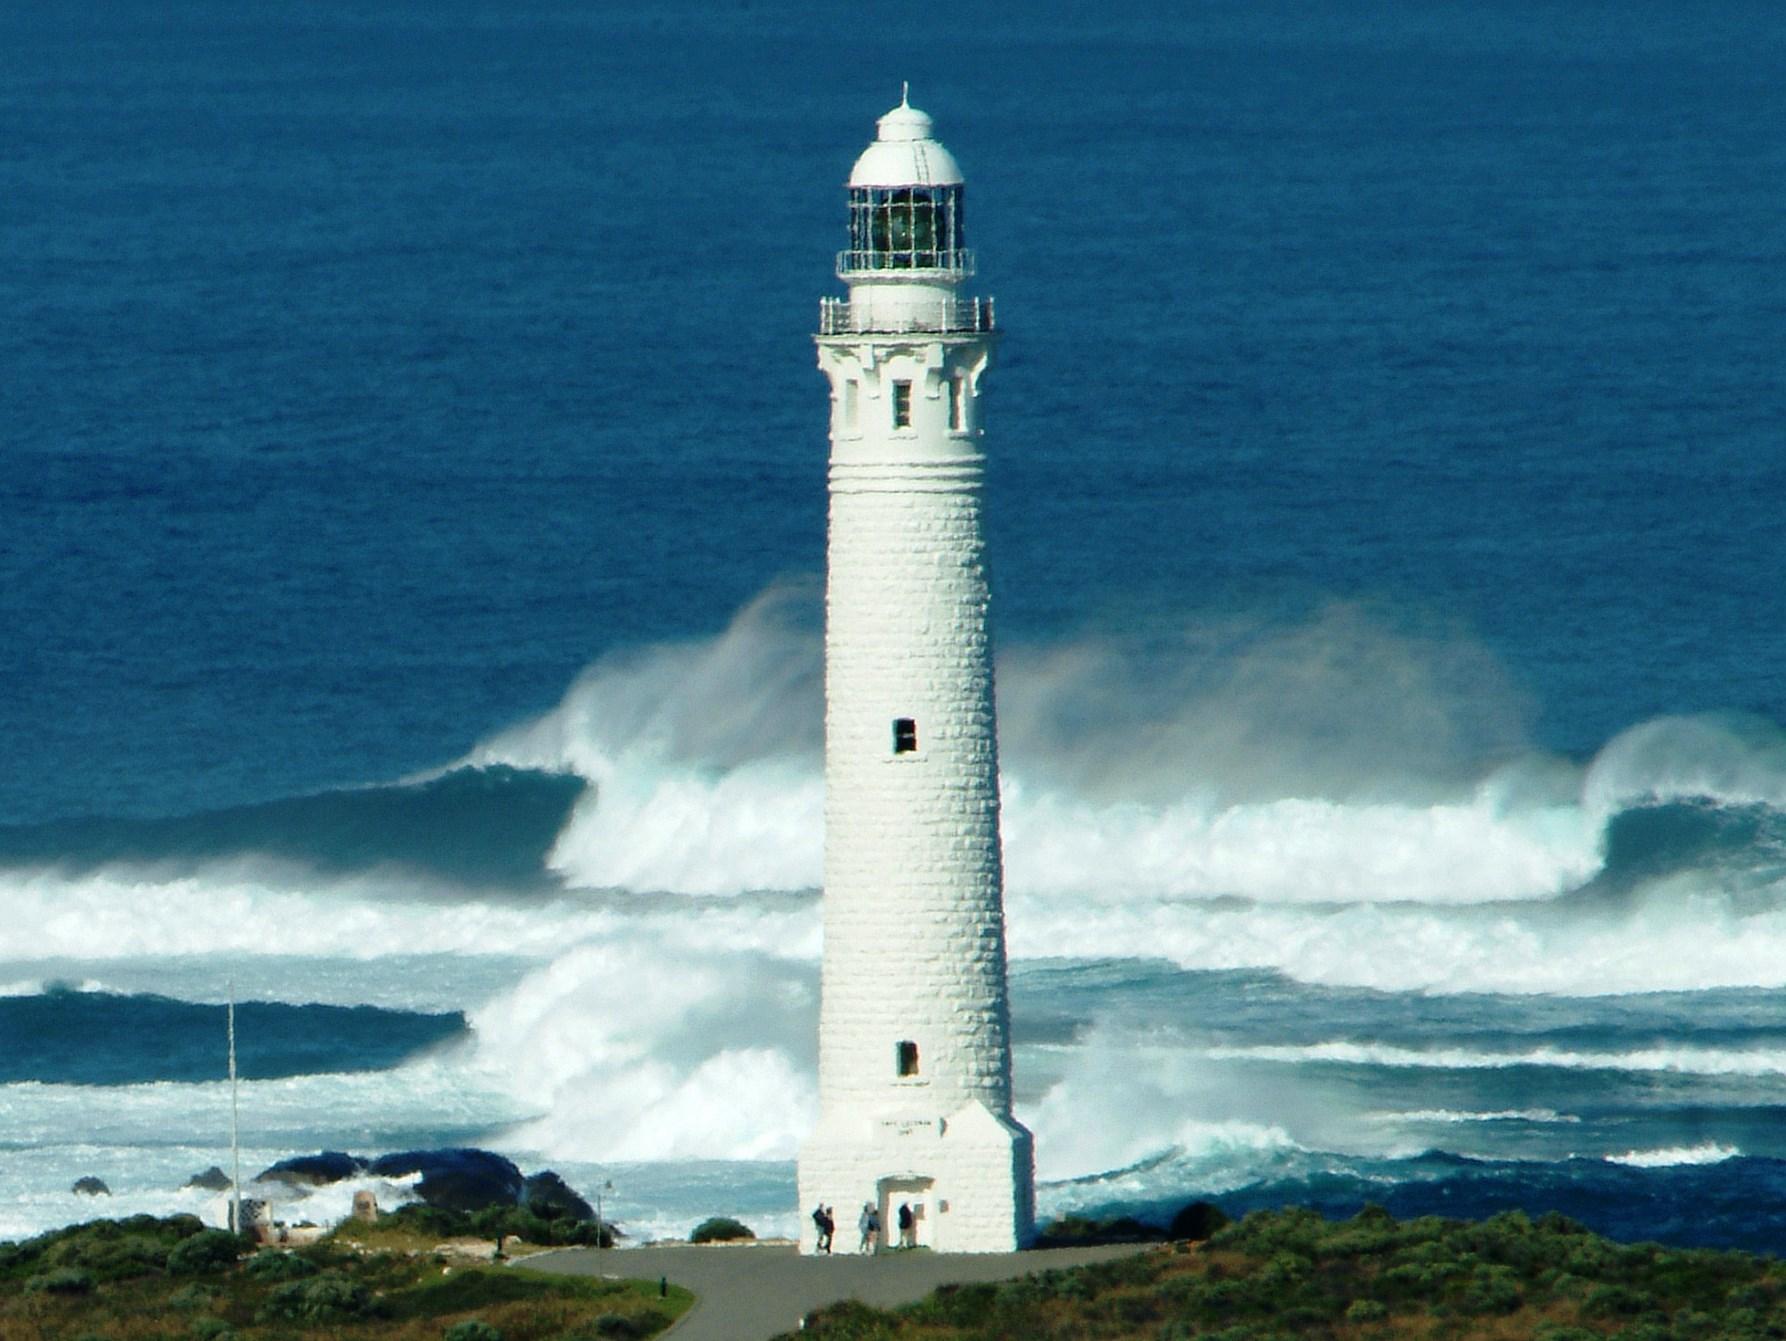 31.cape leewin lighthouse 2